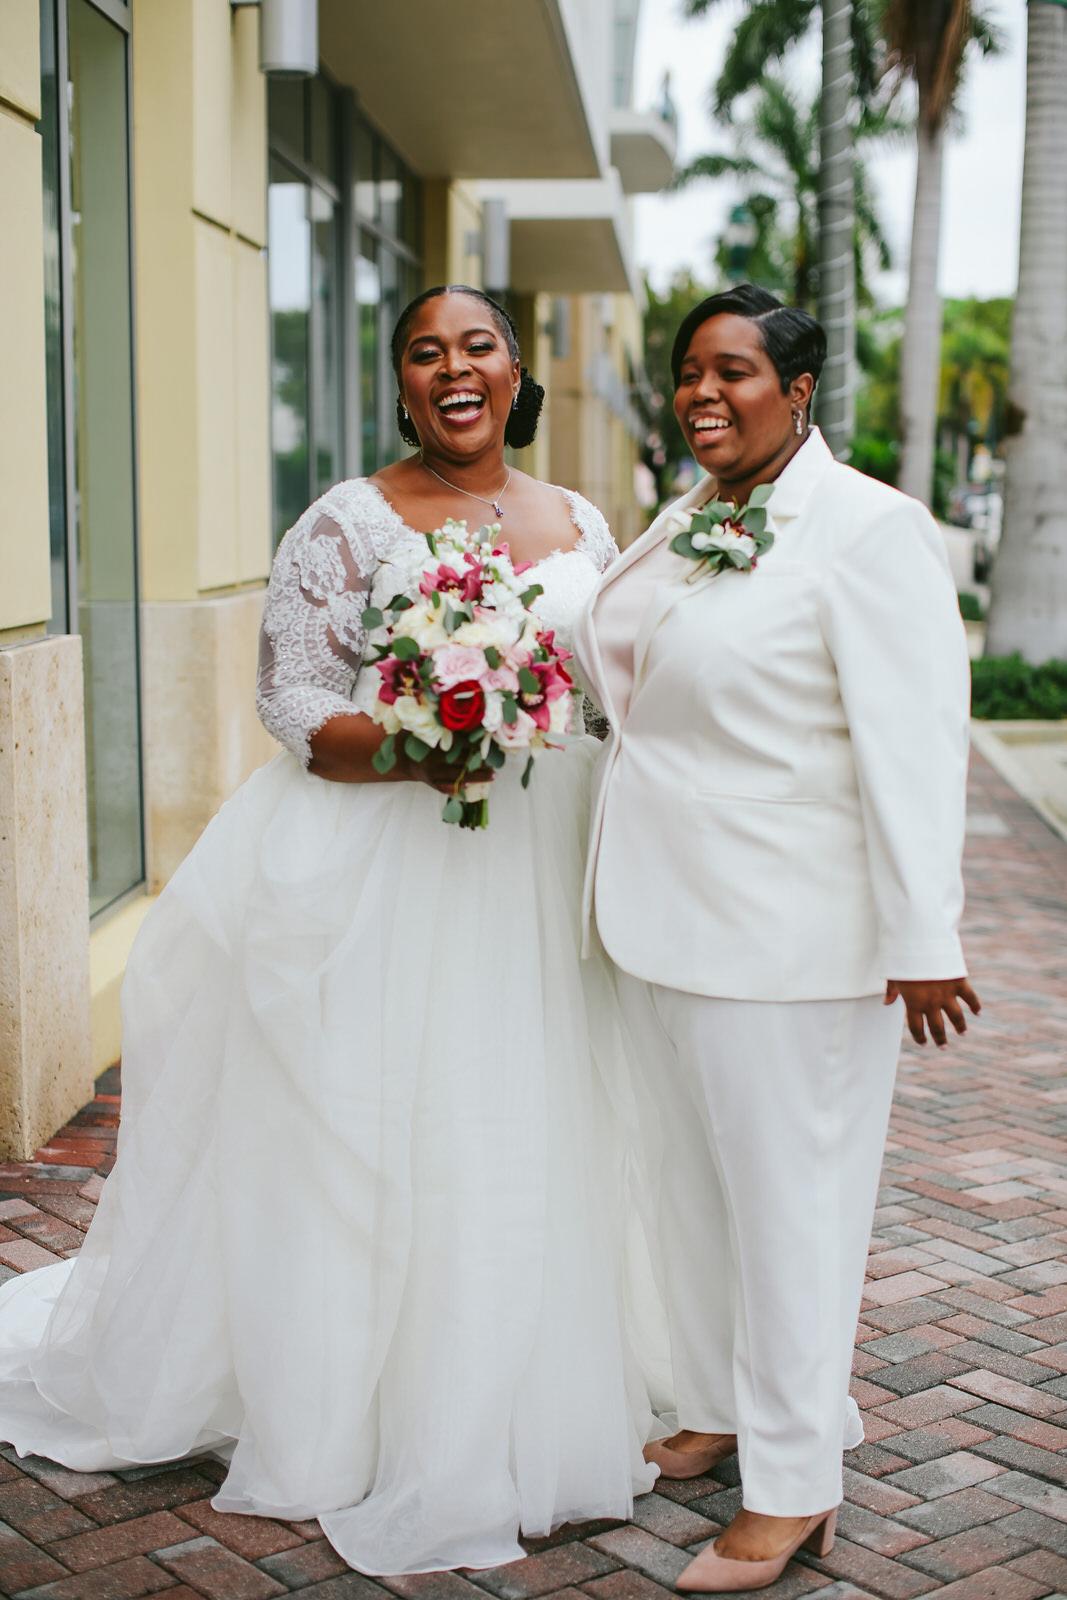 two-brides-tiny-house-photo-lgbtq-wedding-photographer.jpg